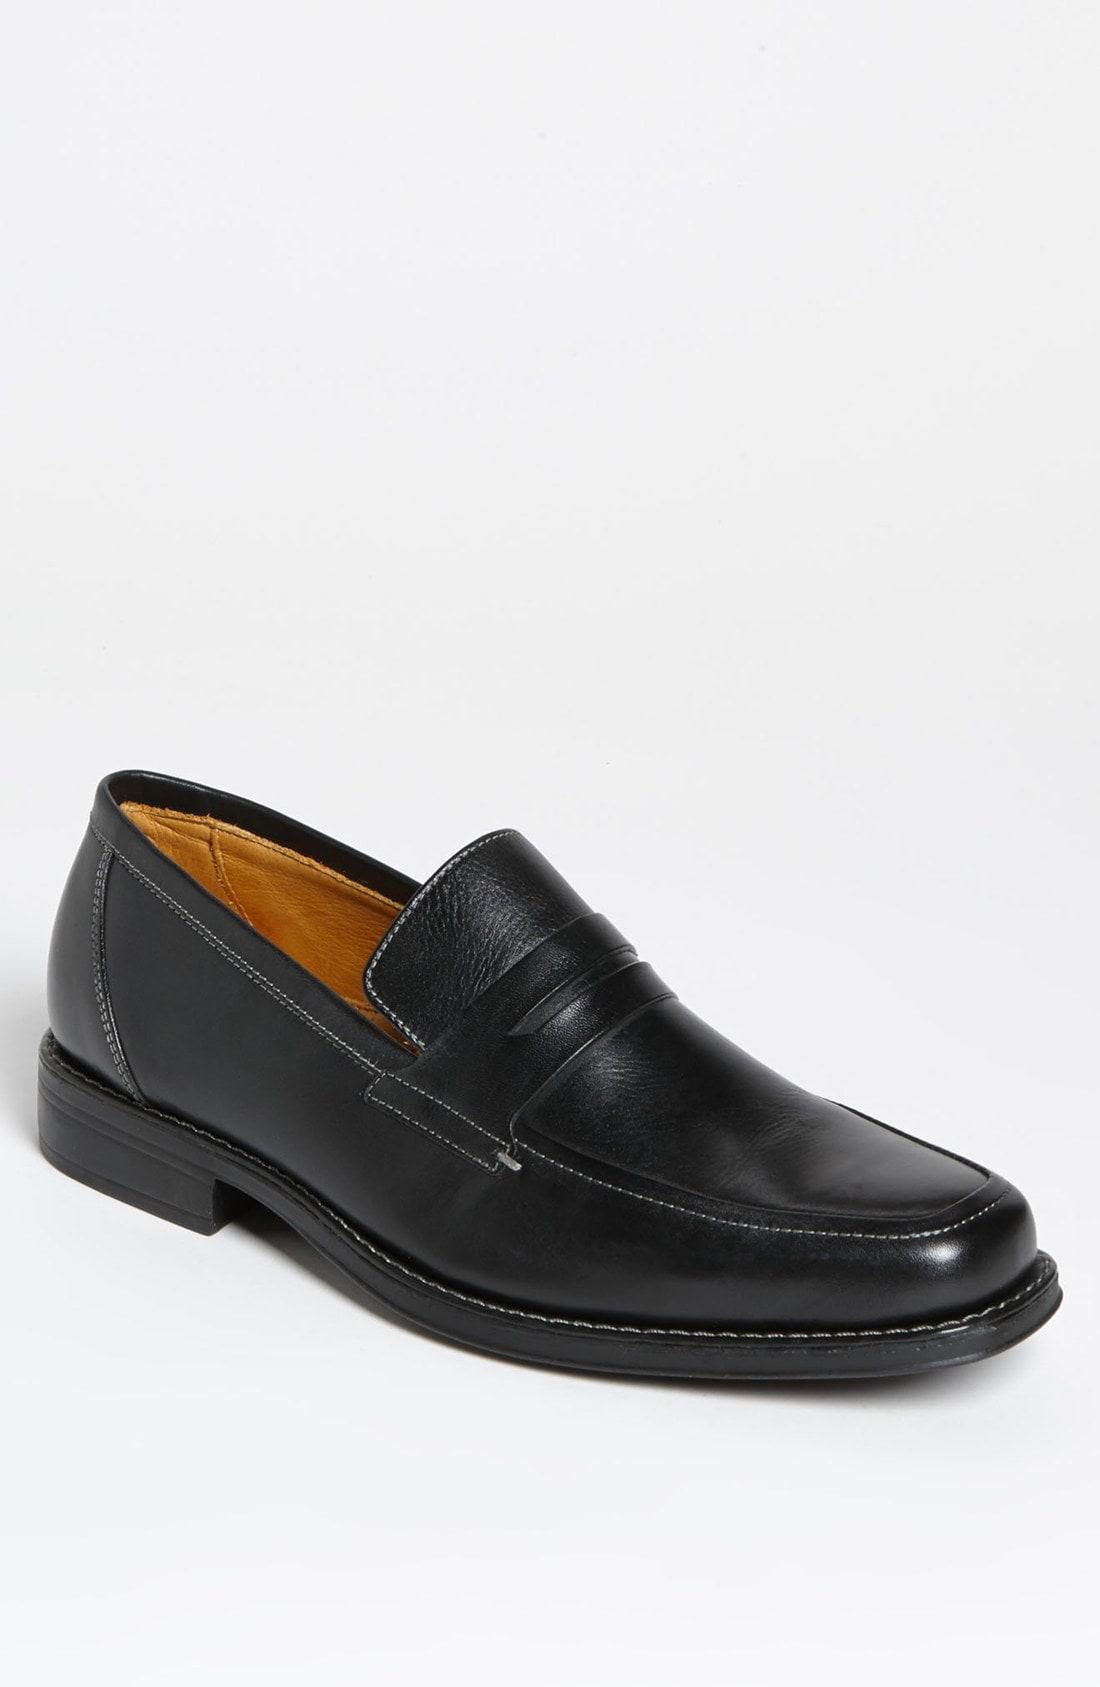 dfcc945cc6b Lyst - Sandro Moscoloni  stuart  Penny Loafer in Black for Men